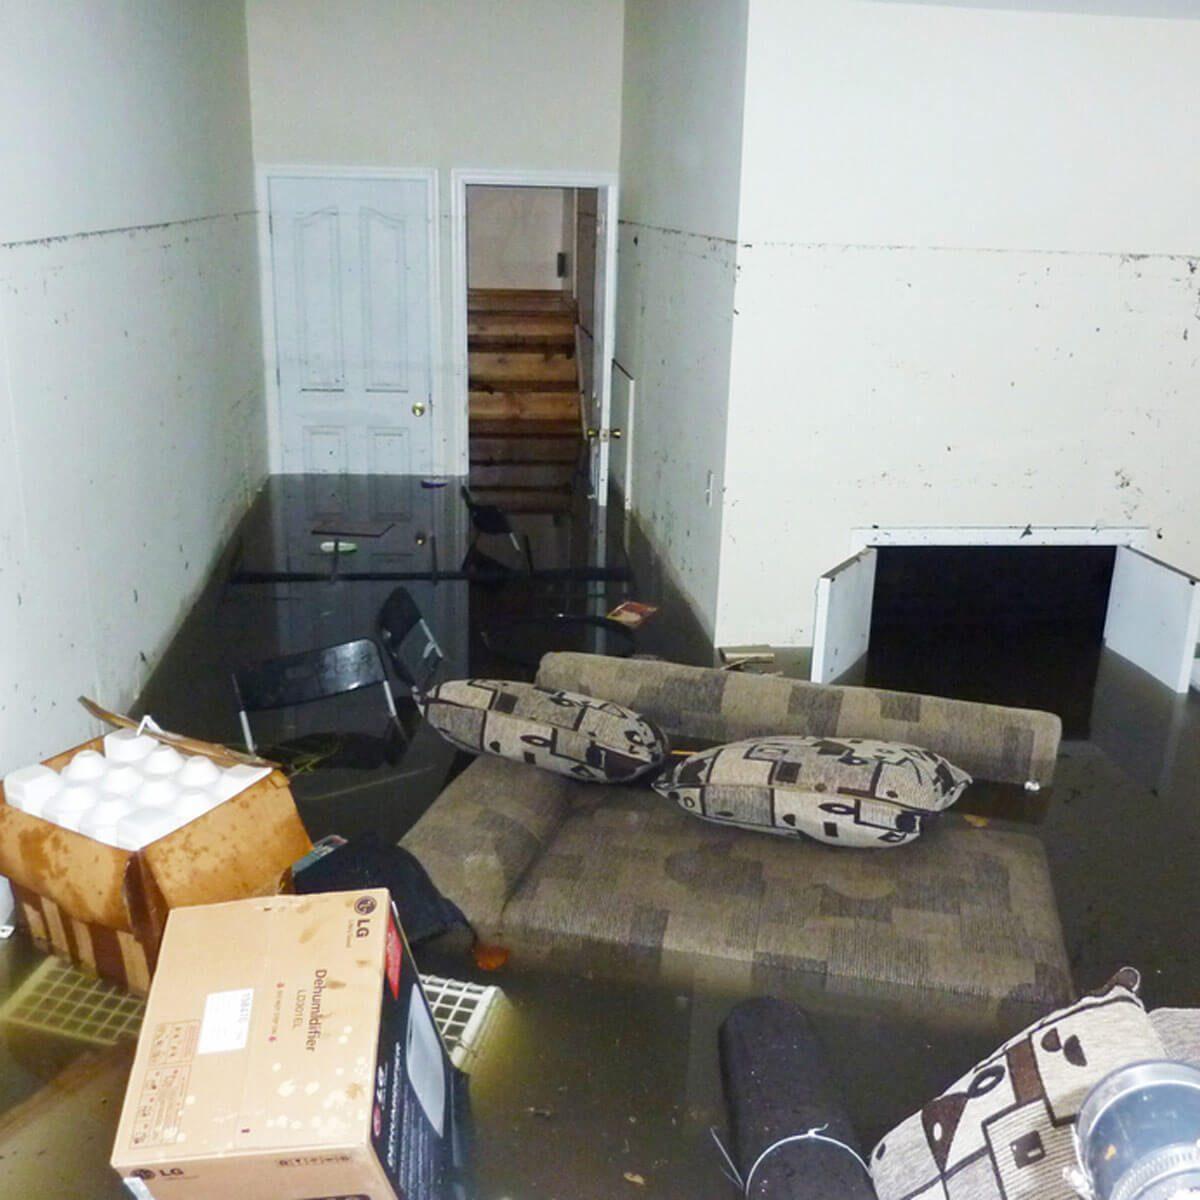 dfh1_shutterstock_139231043 flood damage water damage repair